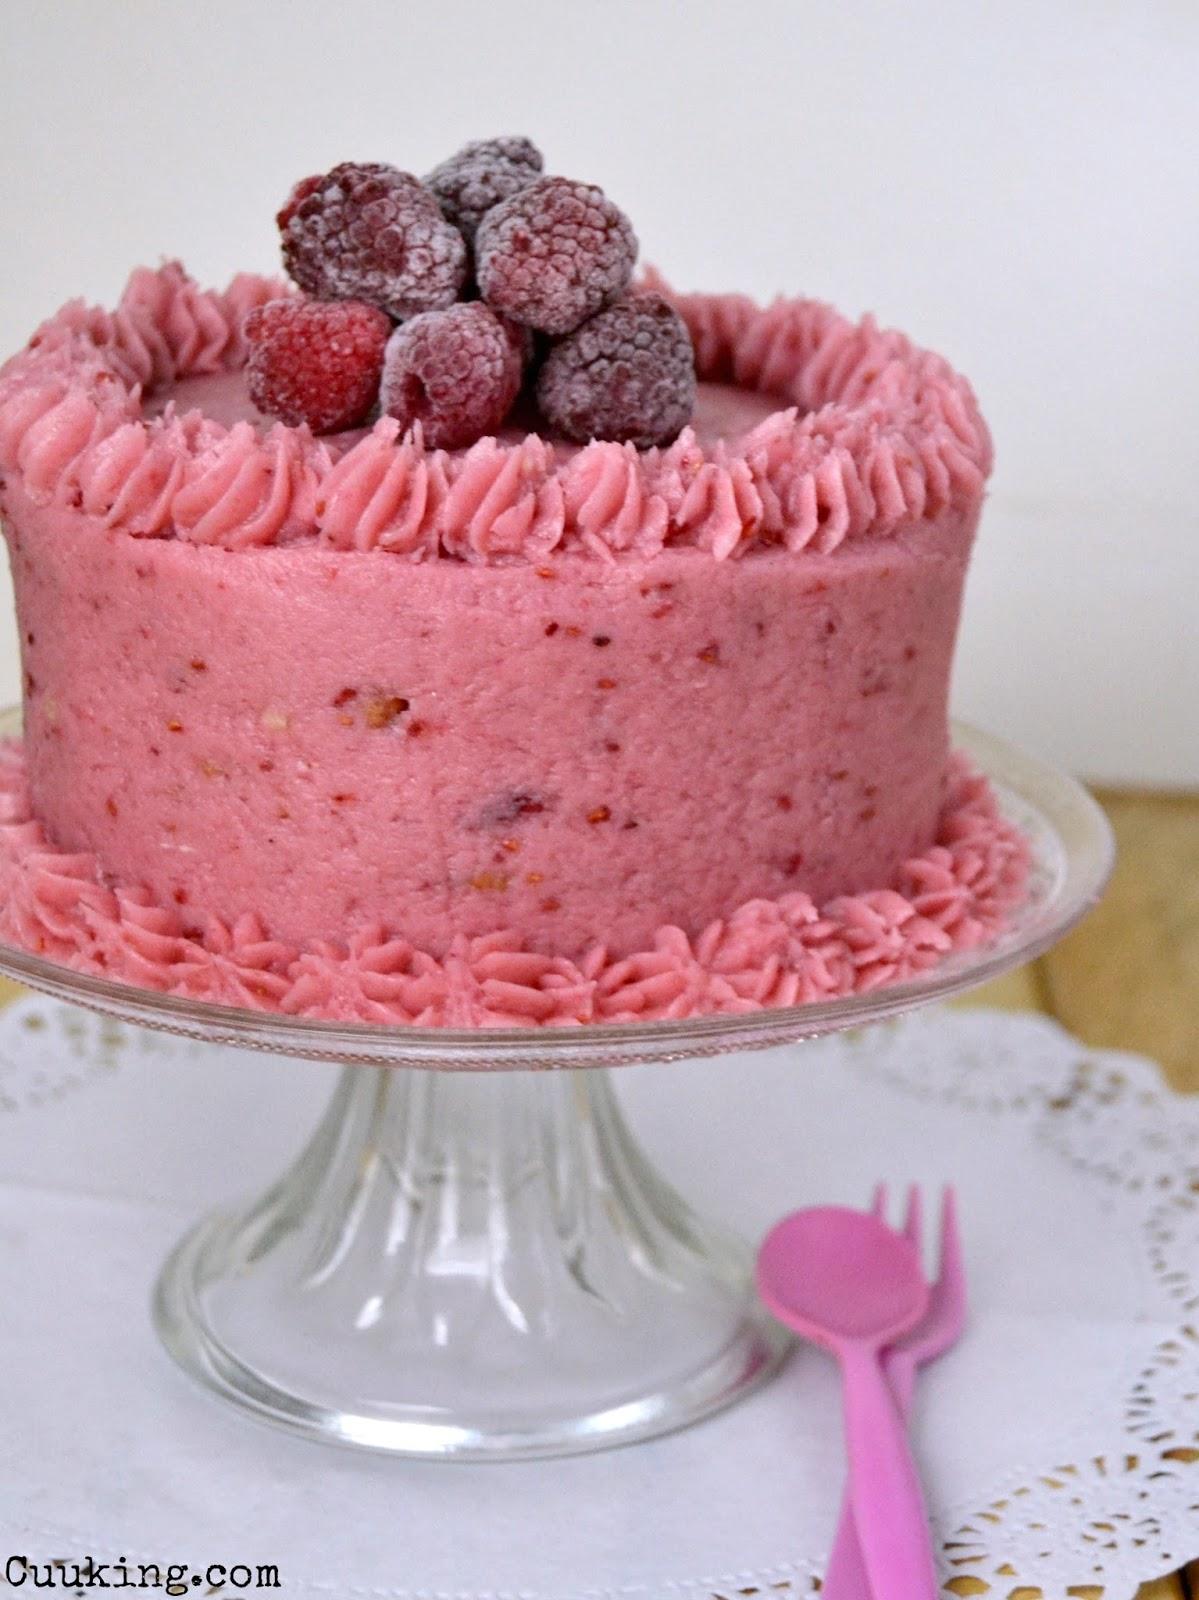 receta-tarta-de-frambuesas-layer-cake.